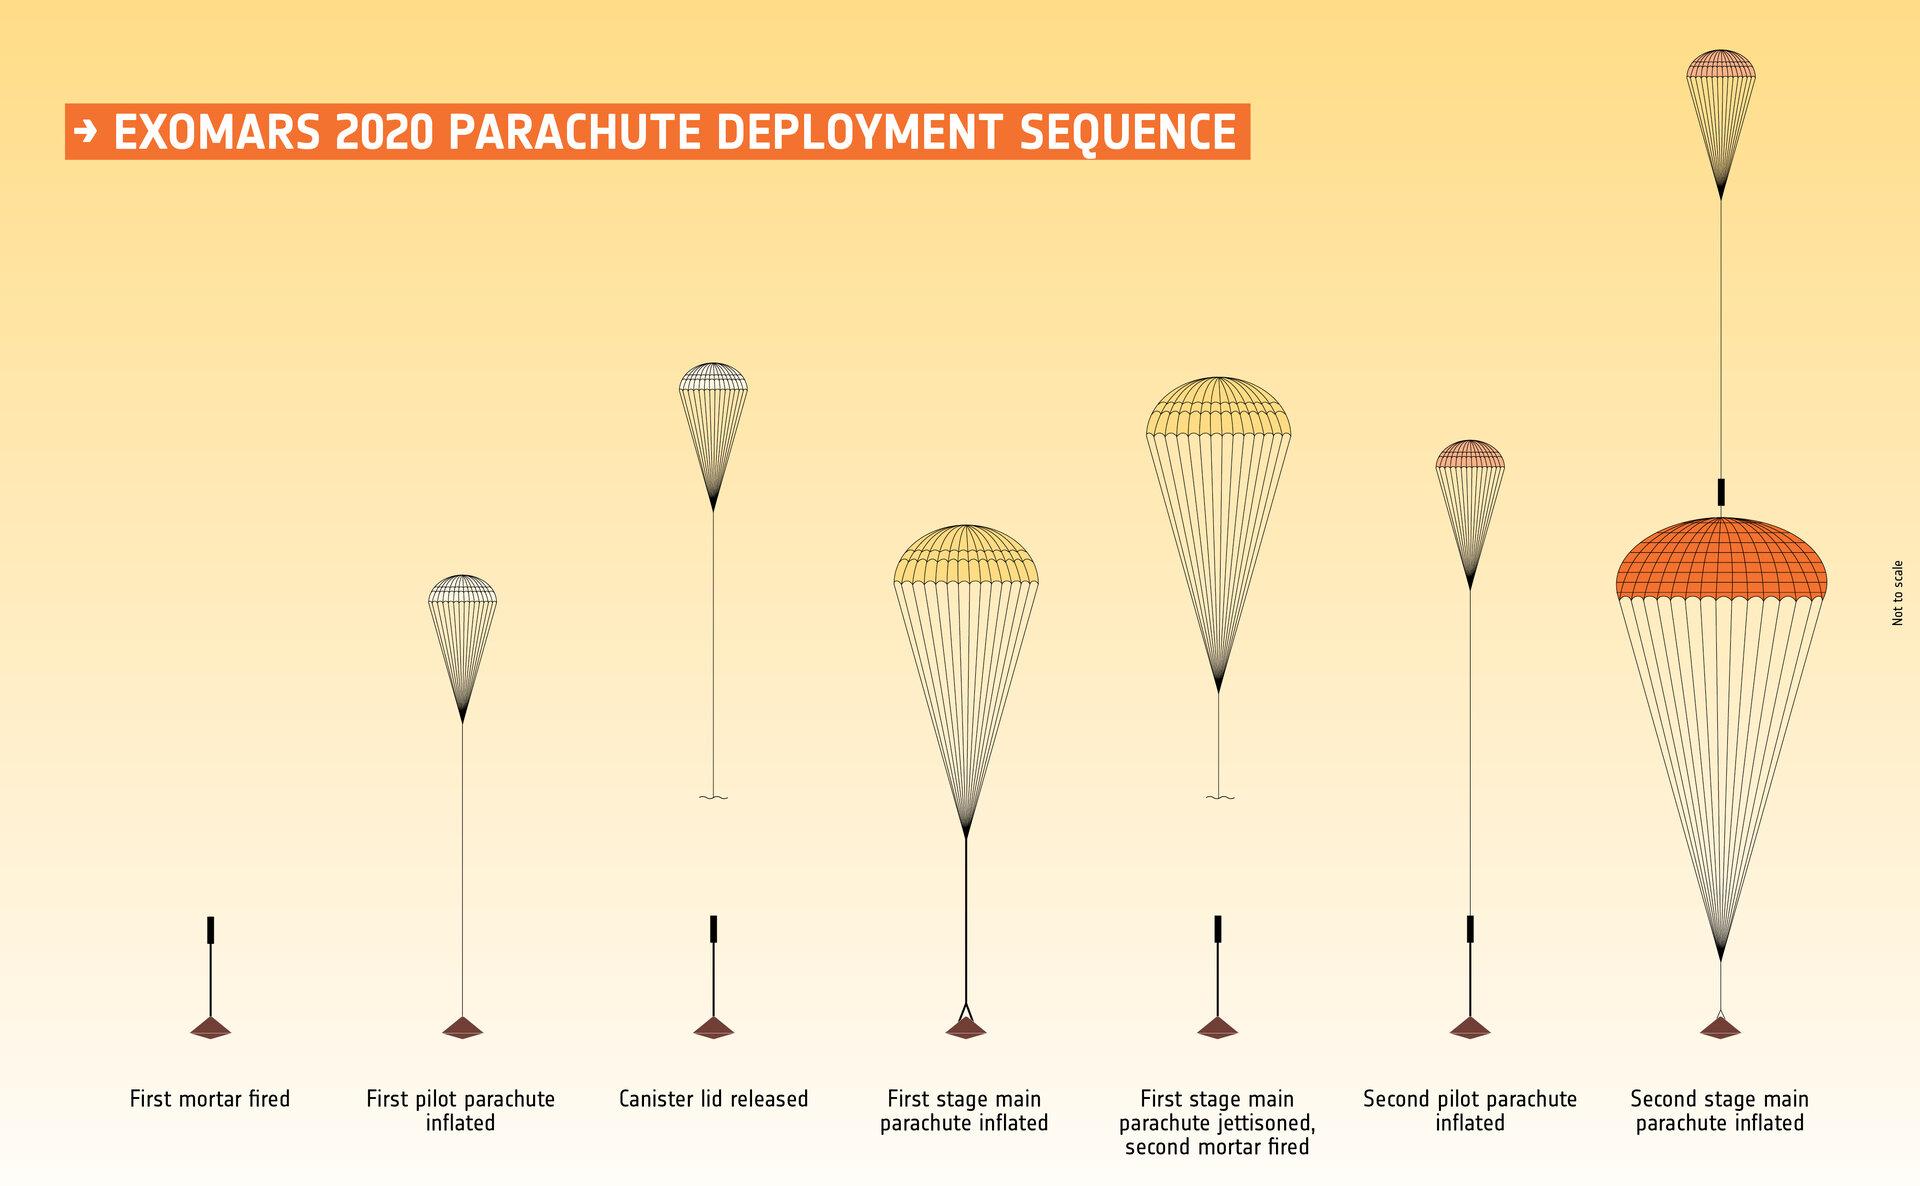 http://www.esa.int/var/esa/storage/images/esa_multimedia/images/2018/03/exomars_2020_parachute_deployment_sequence/17431643-1-eng-GB/ExoMars_2020_parachute_deployment_sequence_pillars.jpg